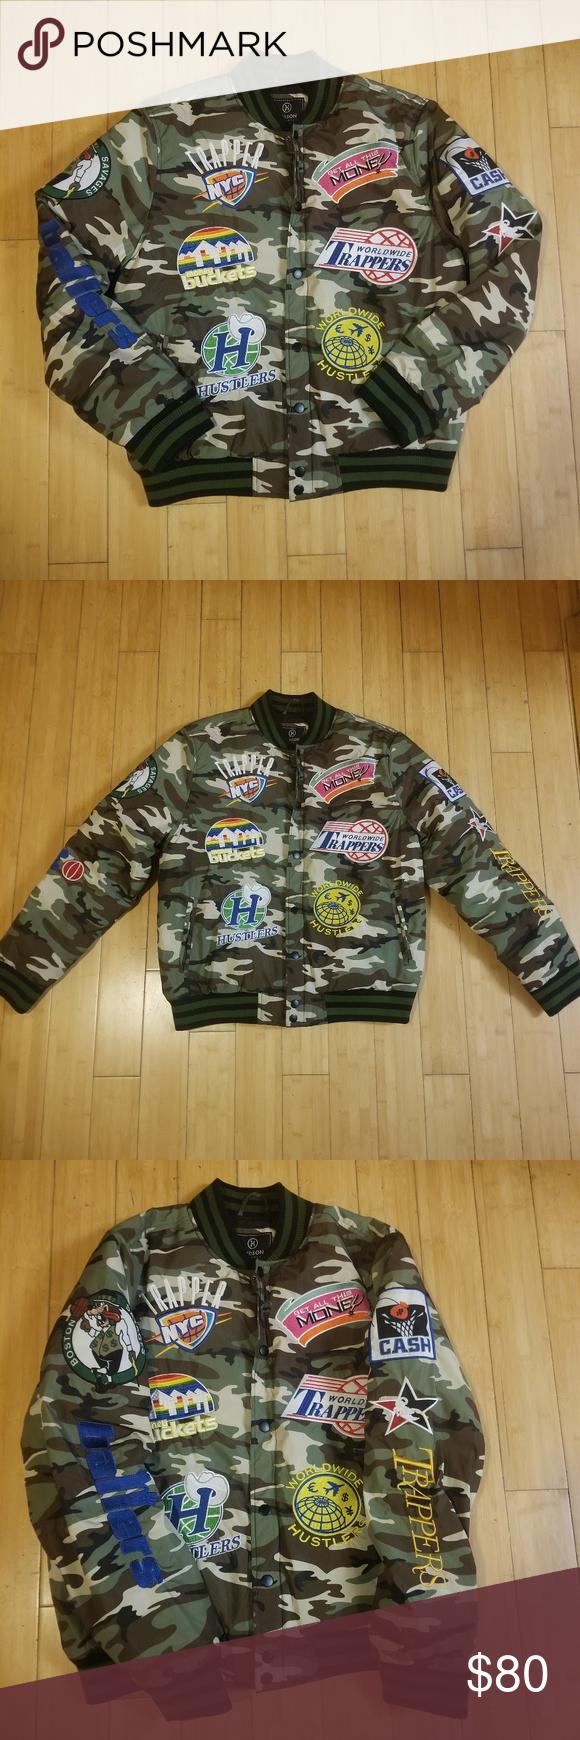 Hudson Outerwear Jacket Clothes Design Outerwear Jackets Fashion [ 1740 x 580 Pixel ]